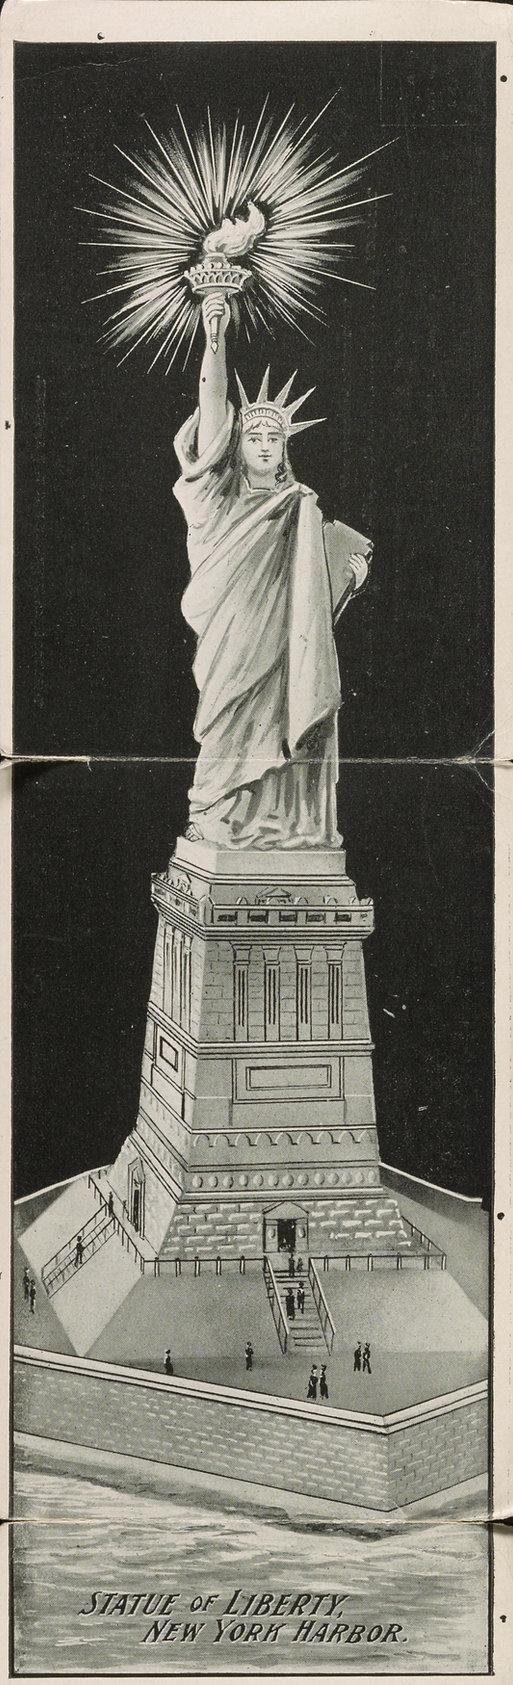 State-of-liberty-postcard-02598u-compres